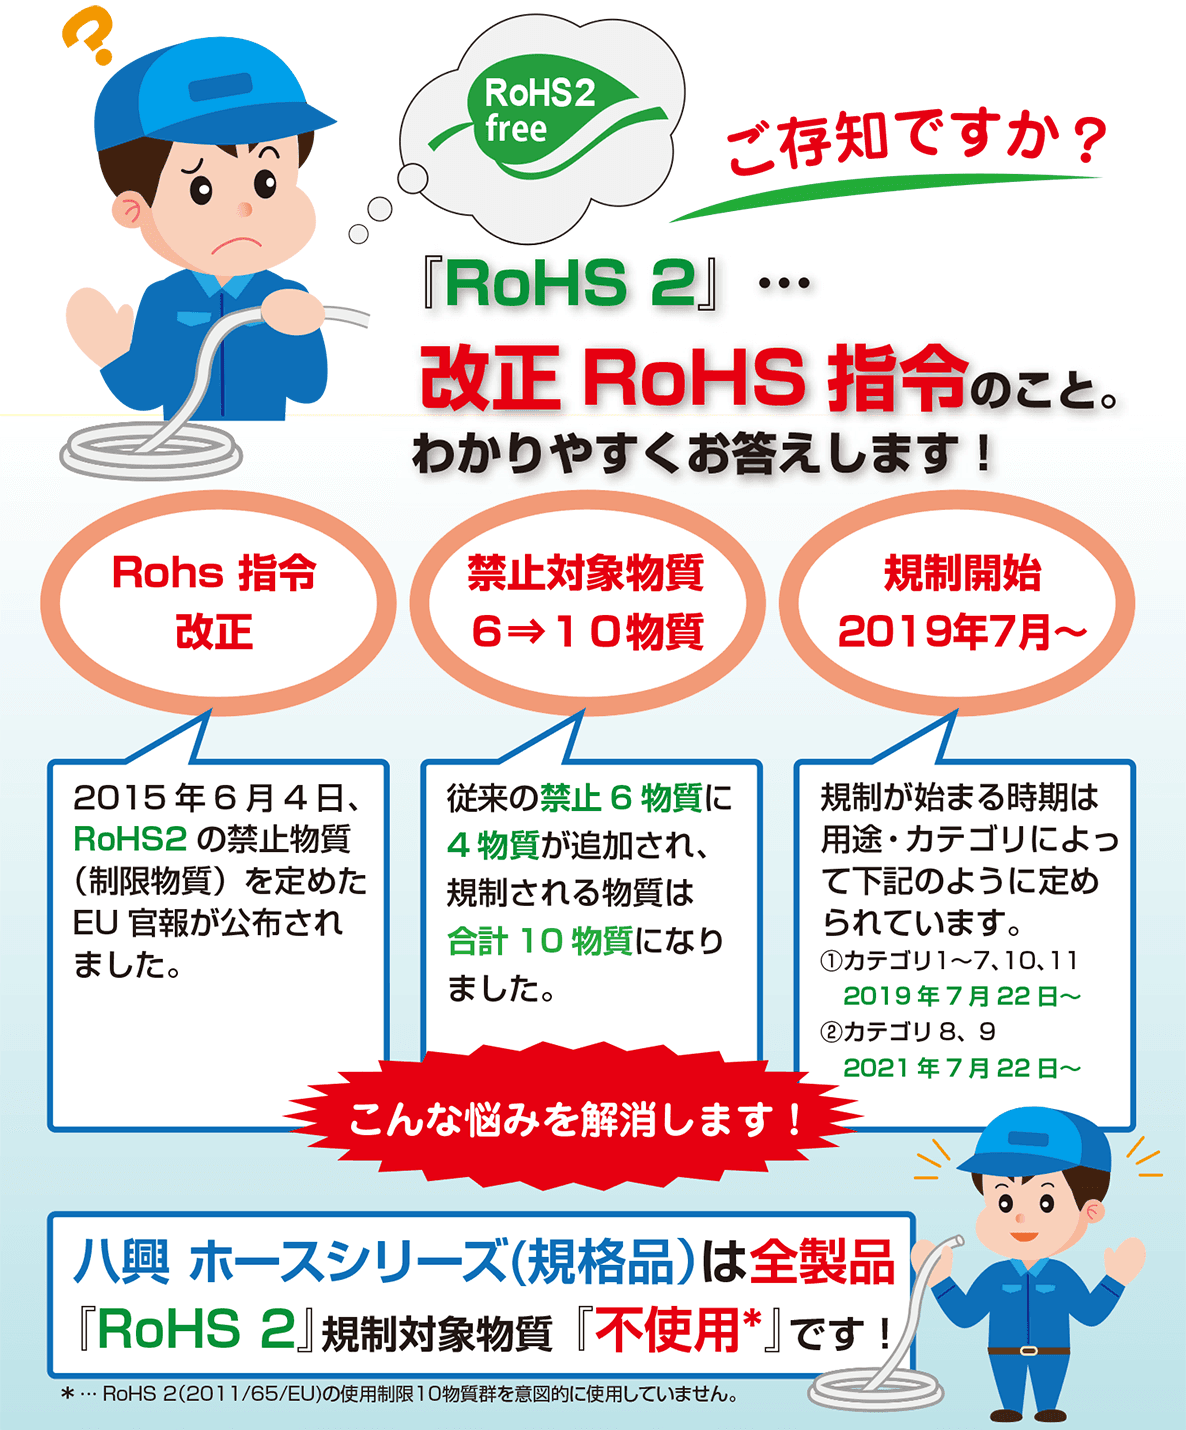 RoHS2_hose_201906-1 - image